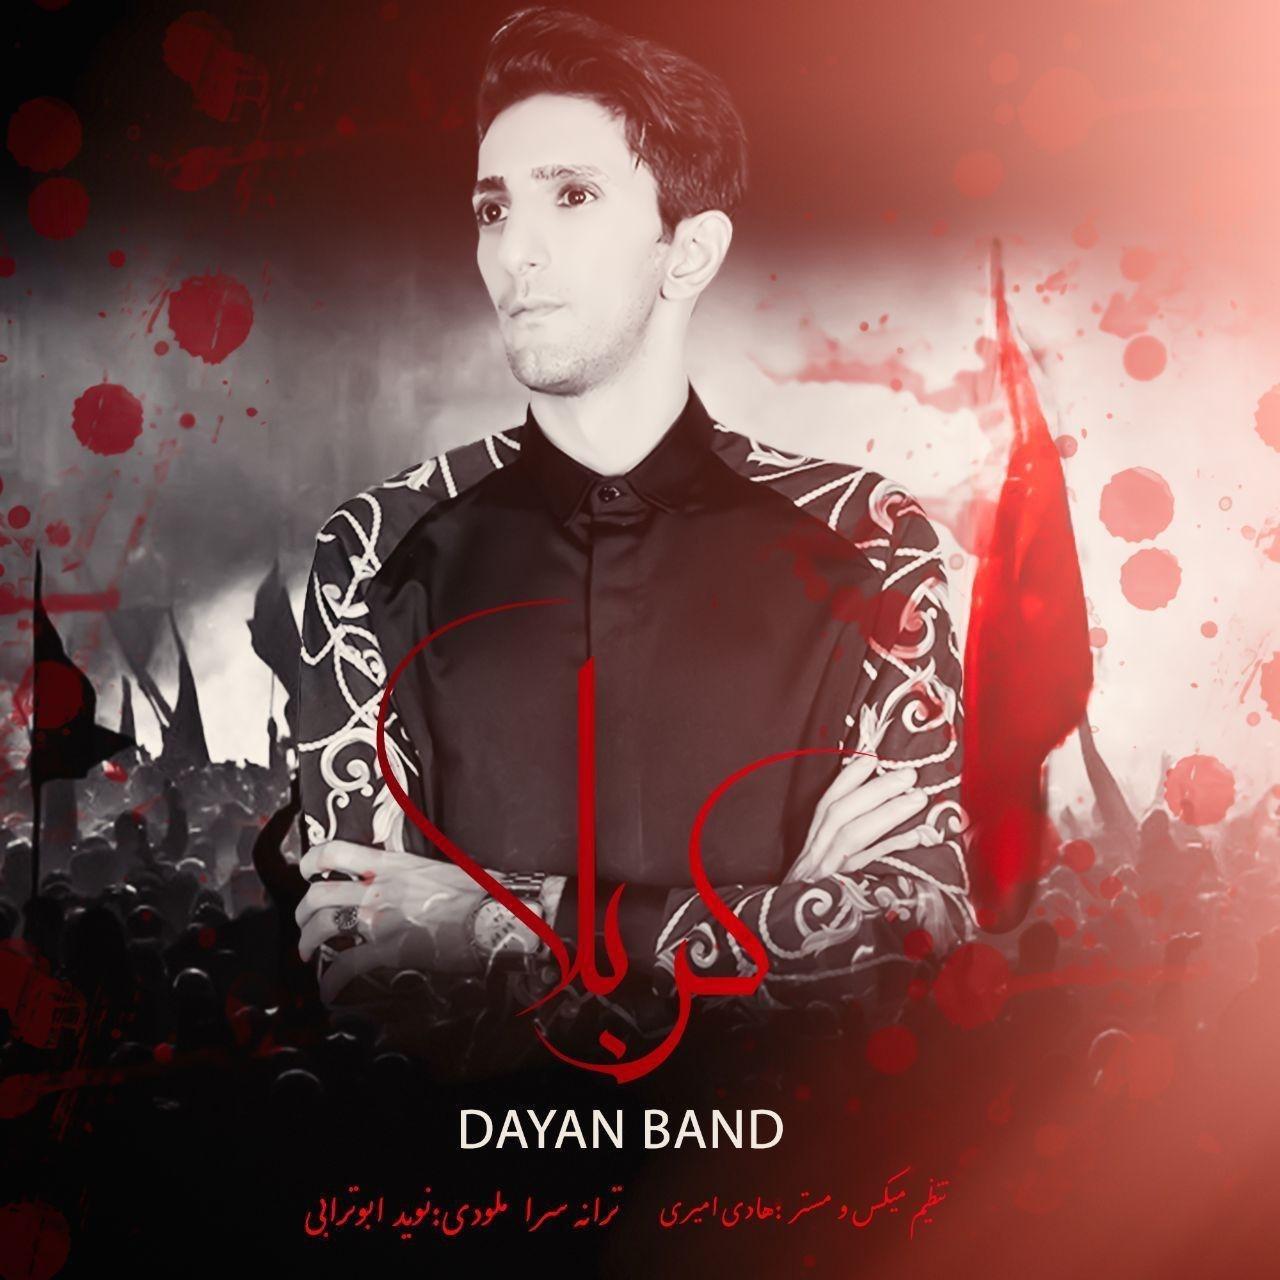 http://s14.picofile.com/file/8408891968/04Dayan_Band_Karbala.jpg